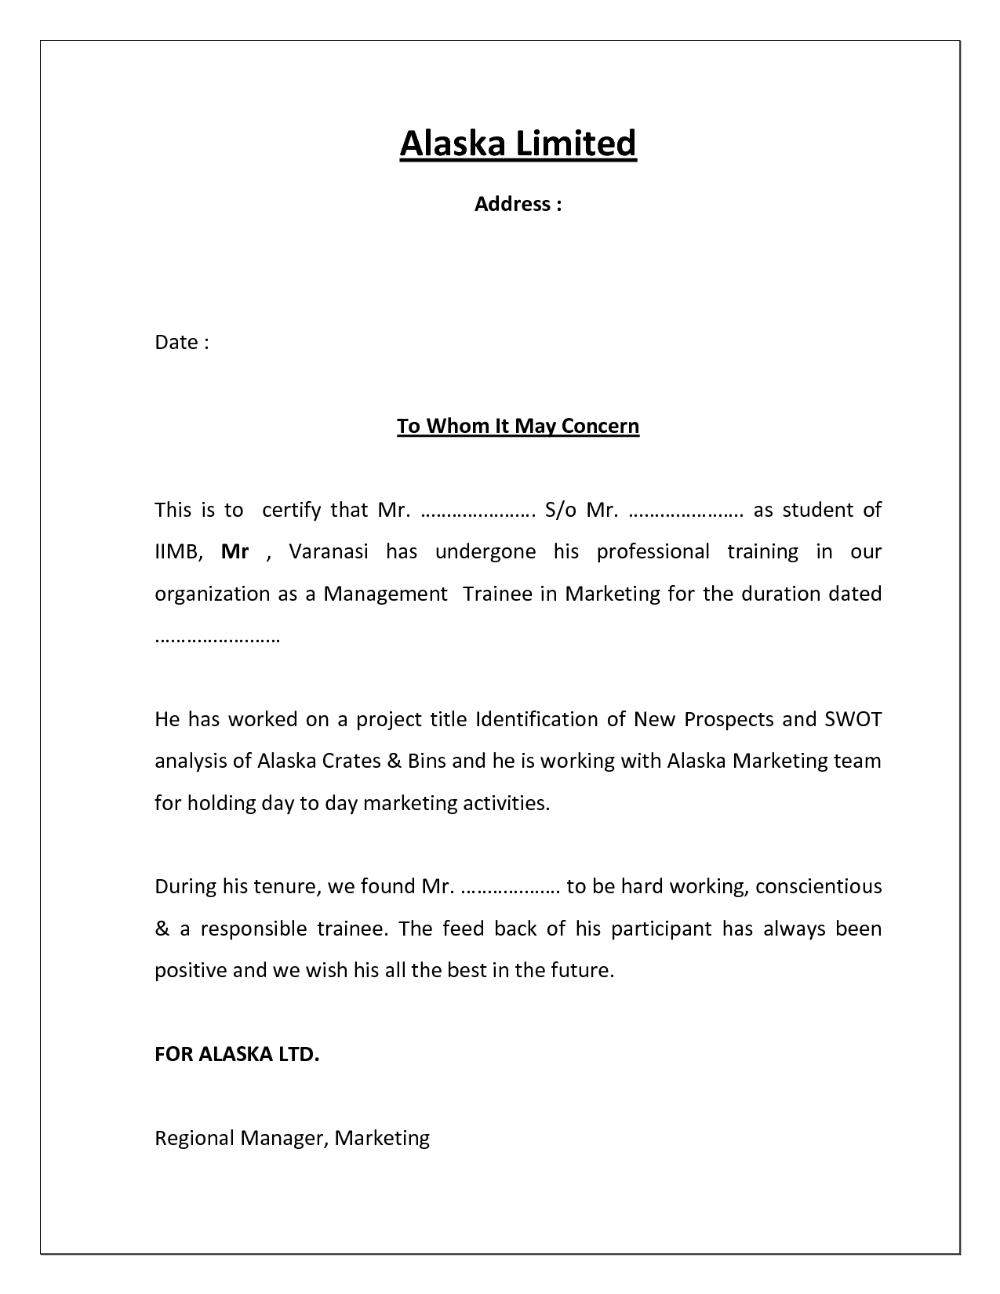 completion certificate sample template letter acceptance leaving professional resume templates latter vancecountyfair resignation prepare section certificates docs